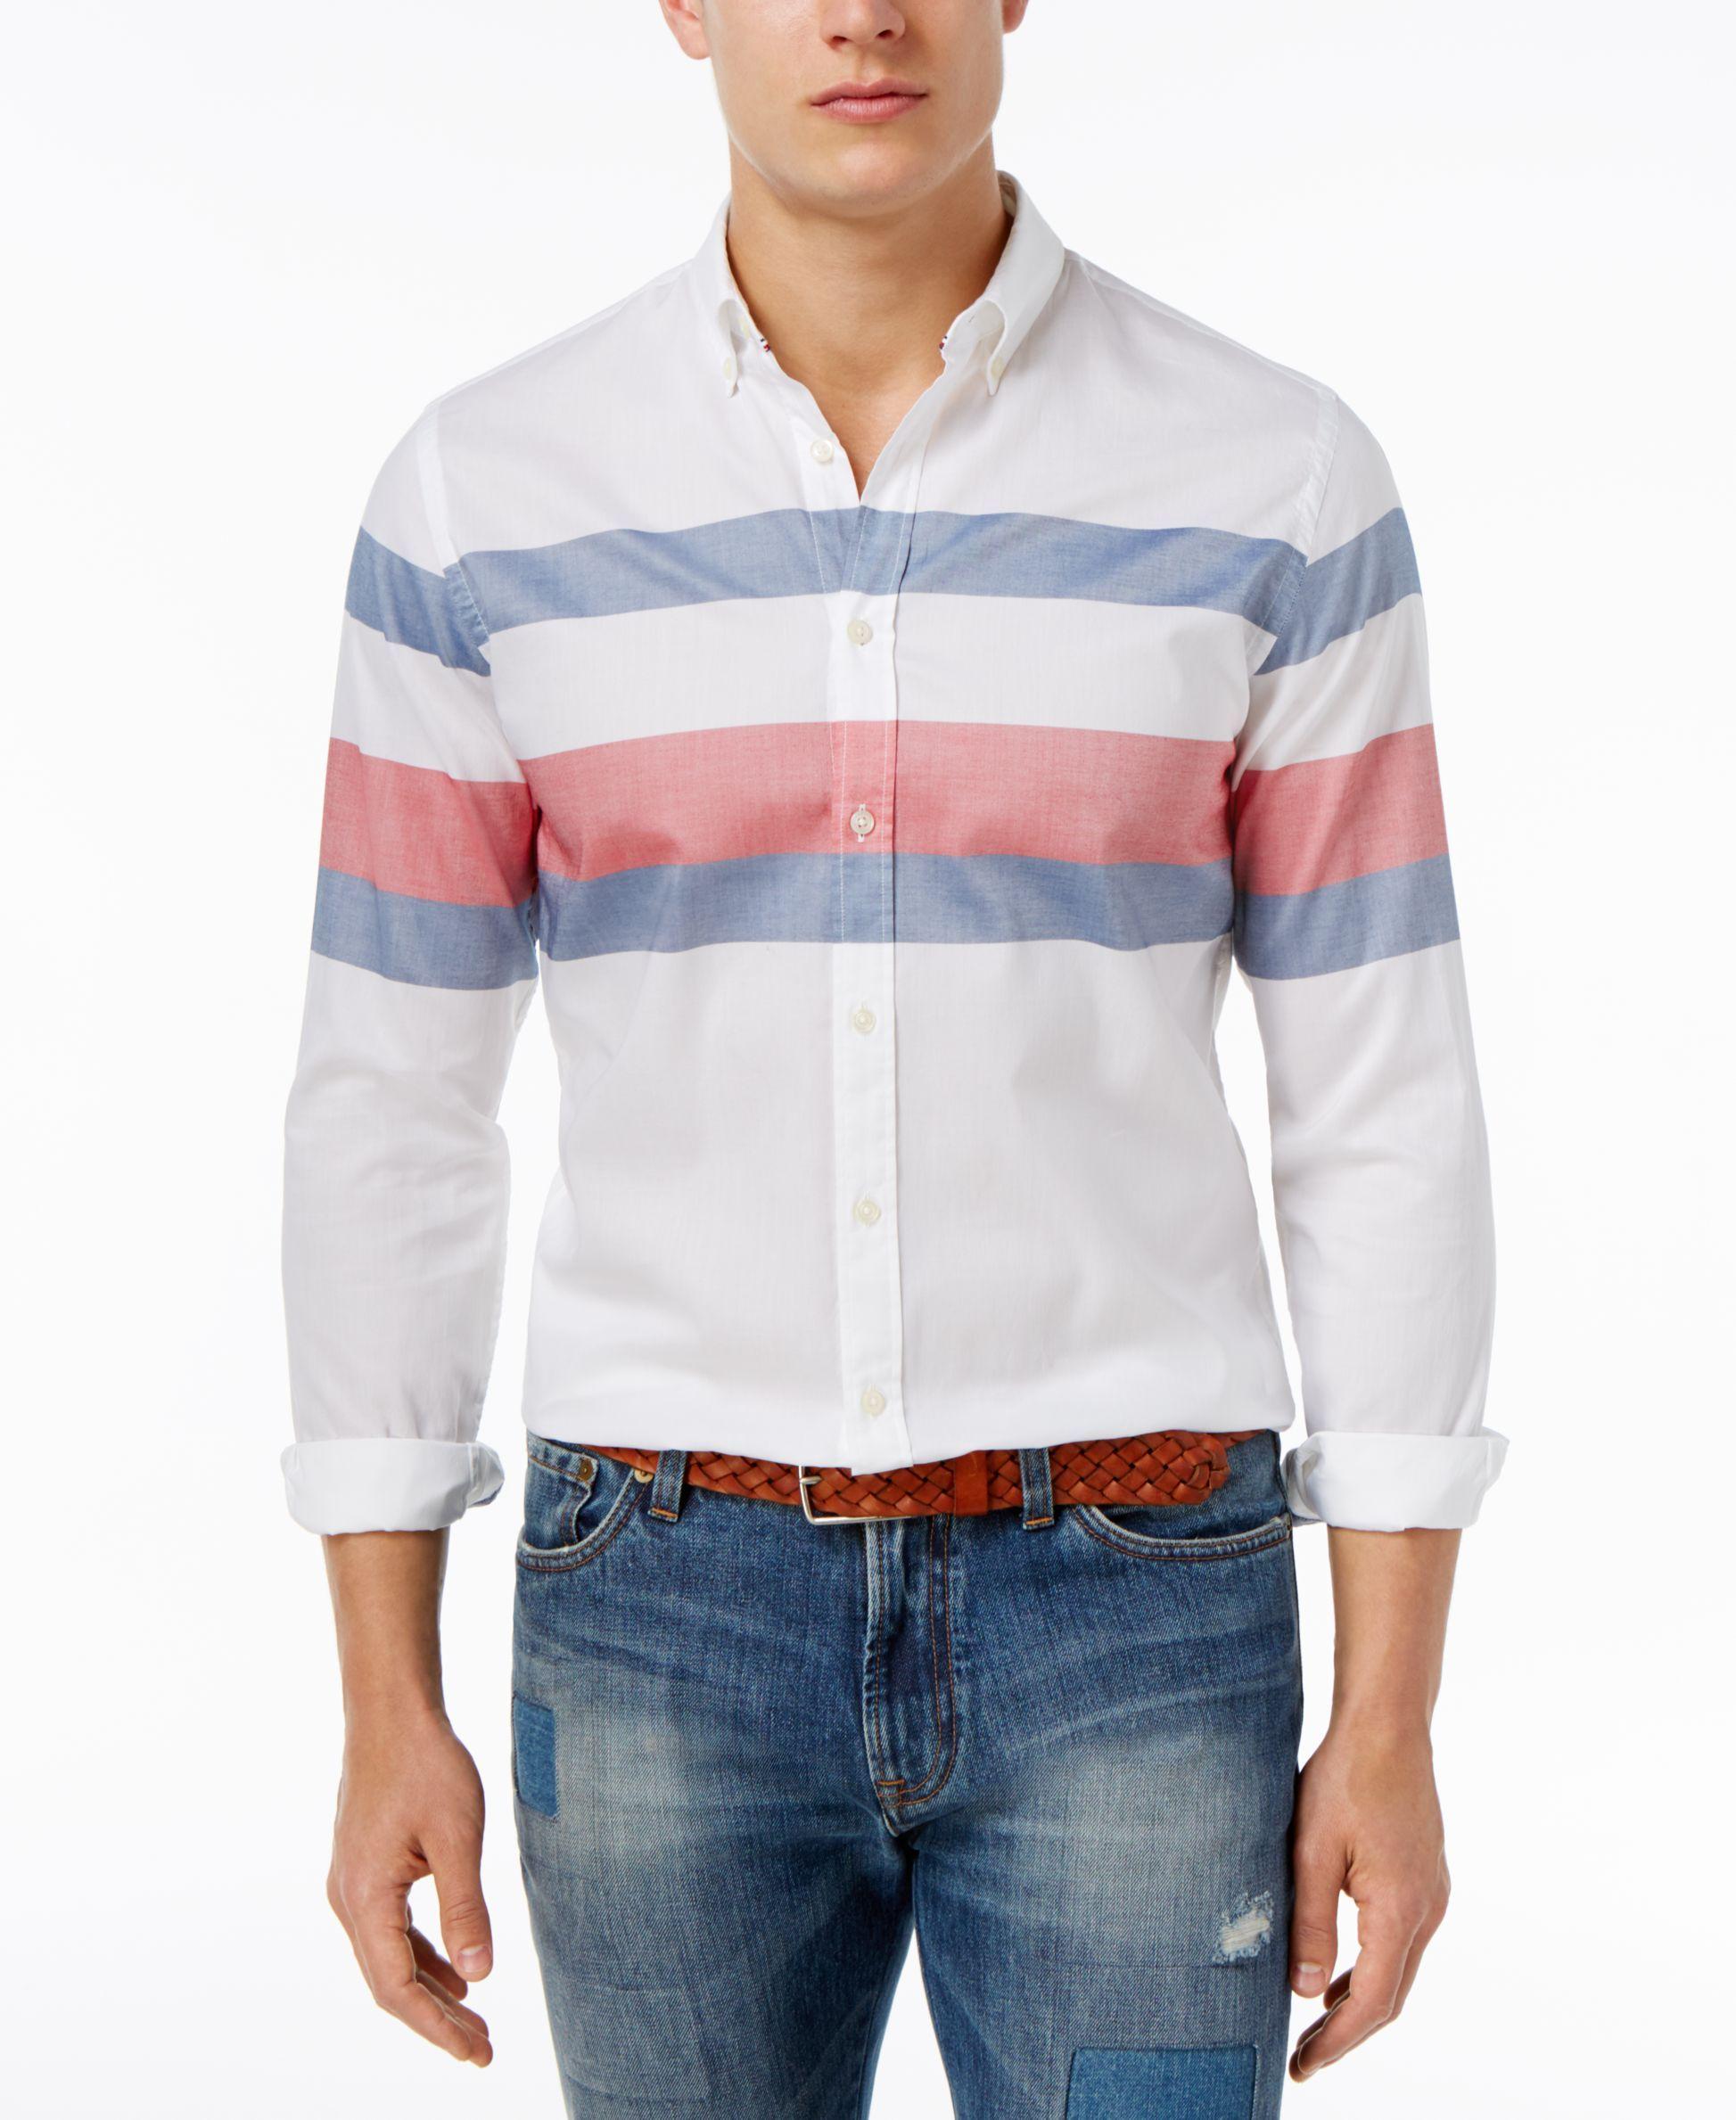 Tommy Hilfiger Men S Blakely Striped Cotton Shirt Striped Shirt Men Tommy Shirt Men Shirt Style [ 2378 x 1947 Pixel ]